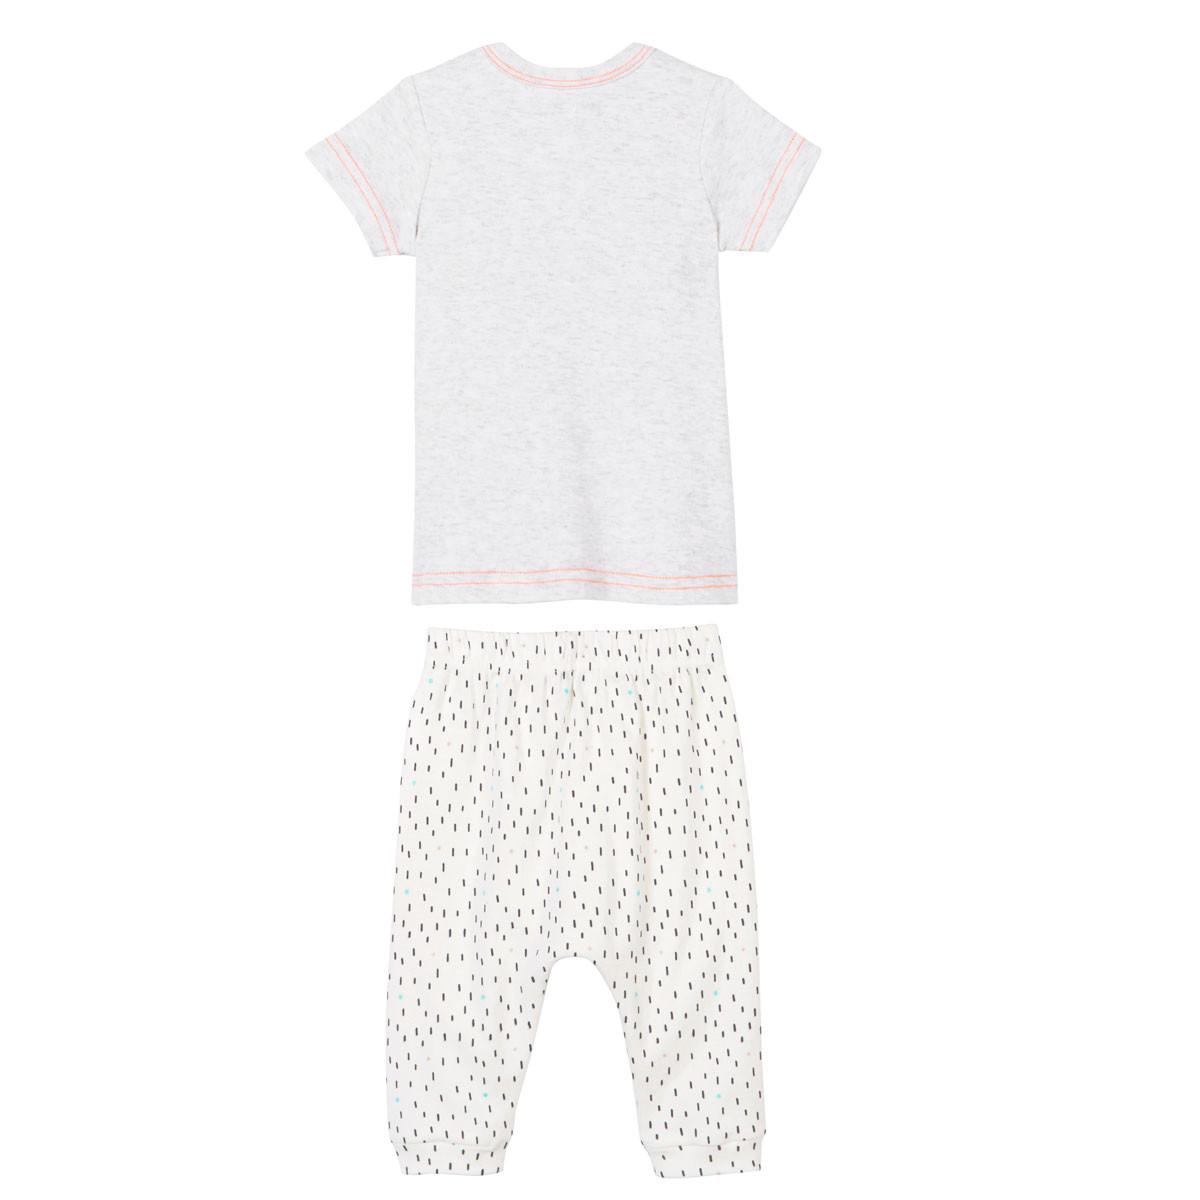 Ensemble bébé garçon t-shirt + sarouel Mini Bandit dos